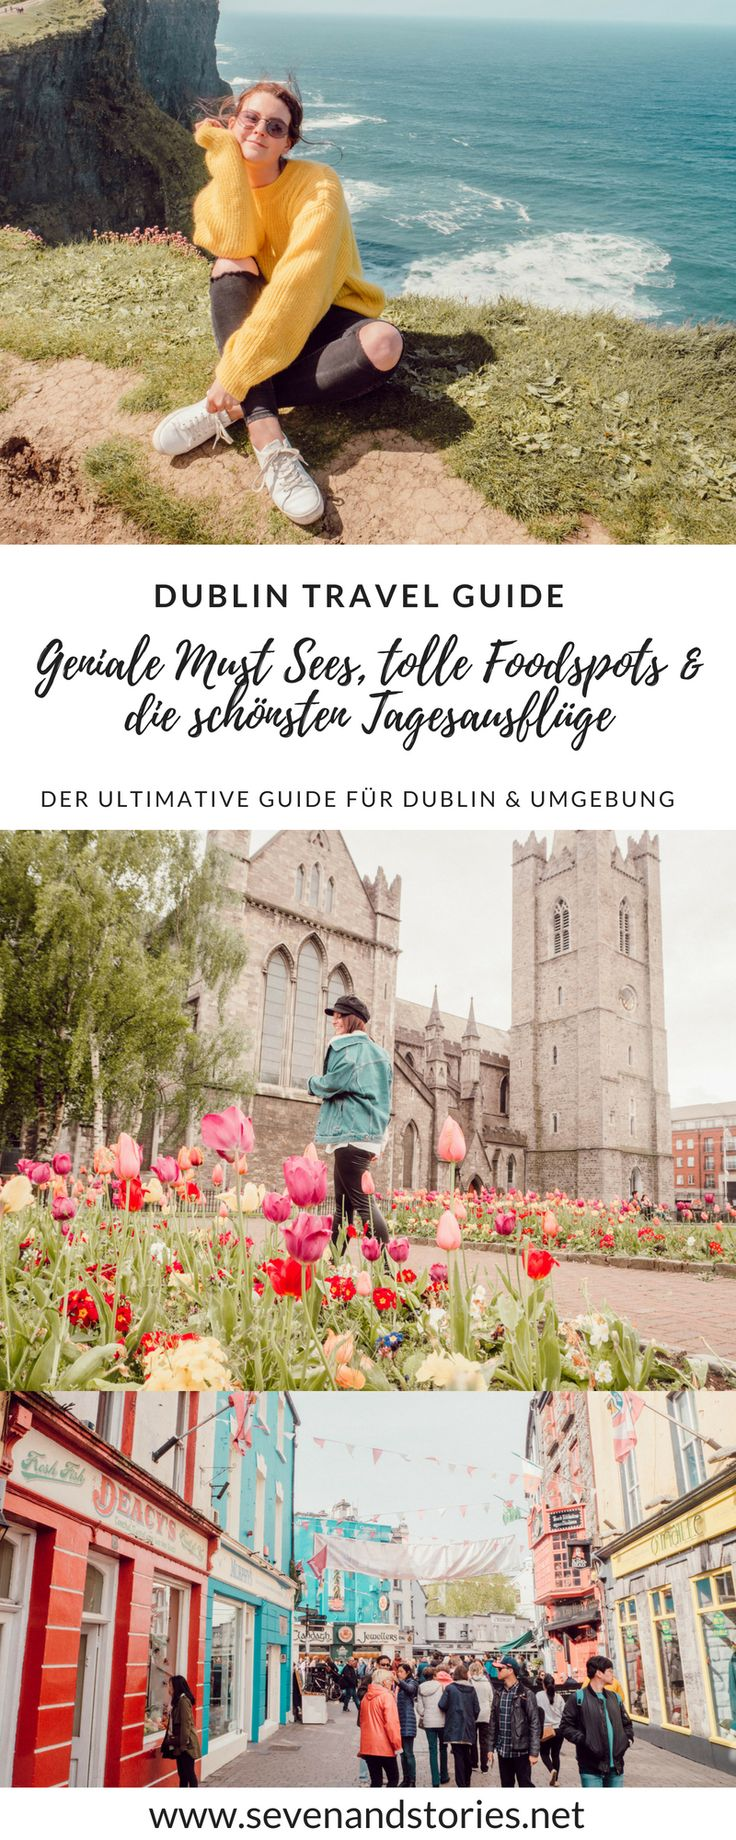 Dublin Travel Guide: Geniale Must Sees, Foodspots und Tipps, die du kennen musst